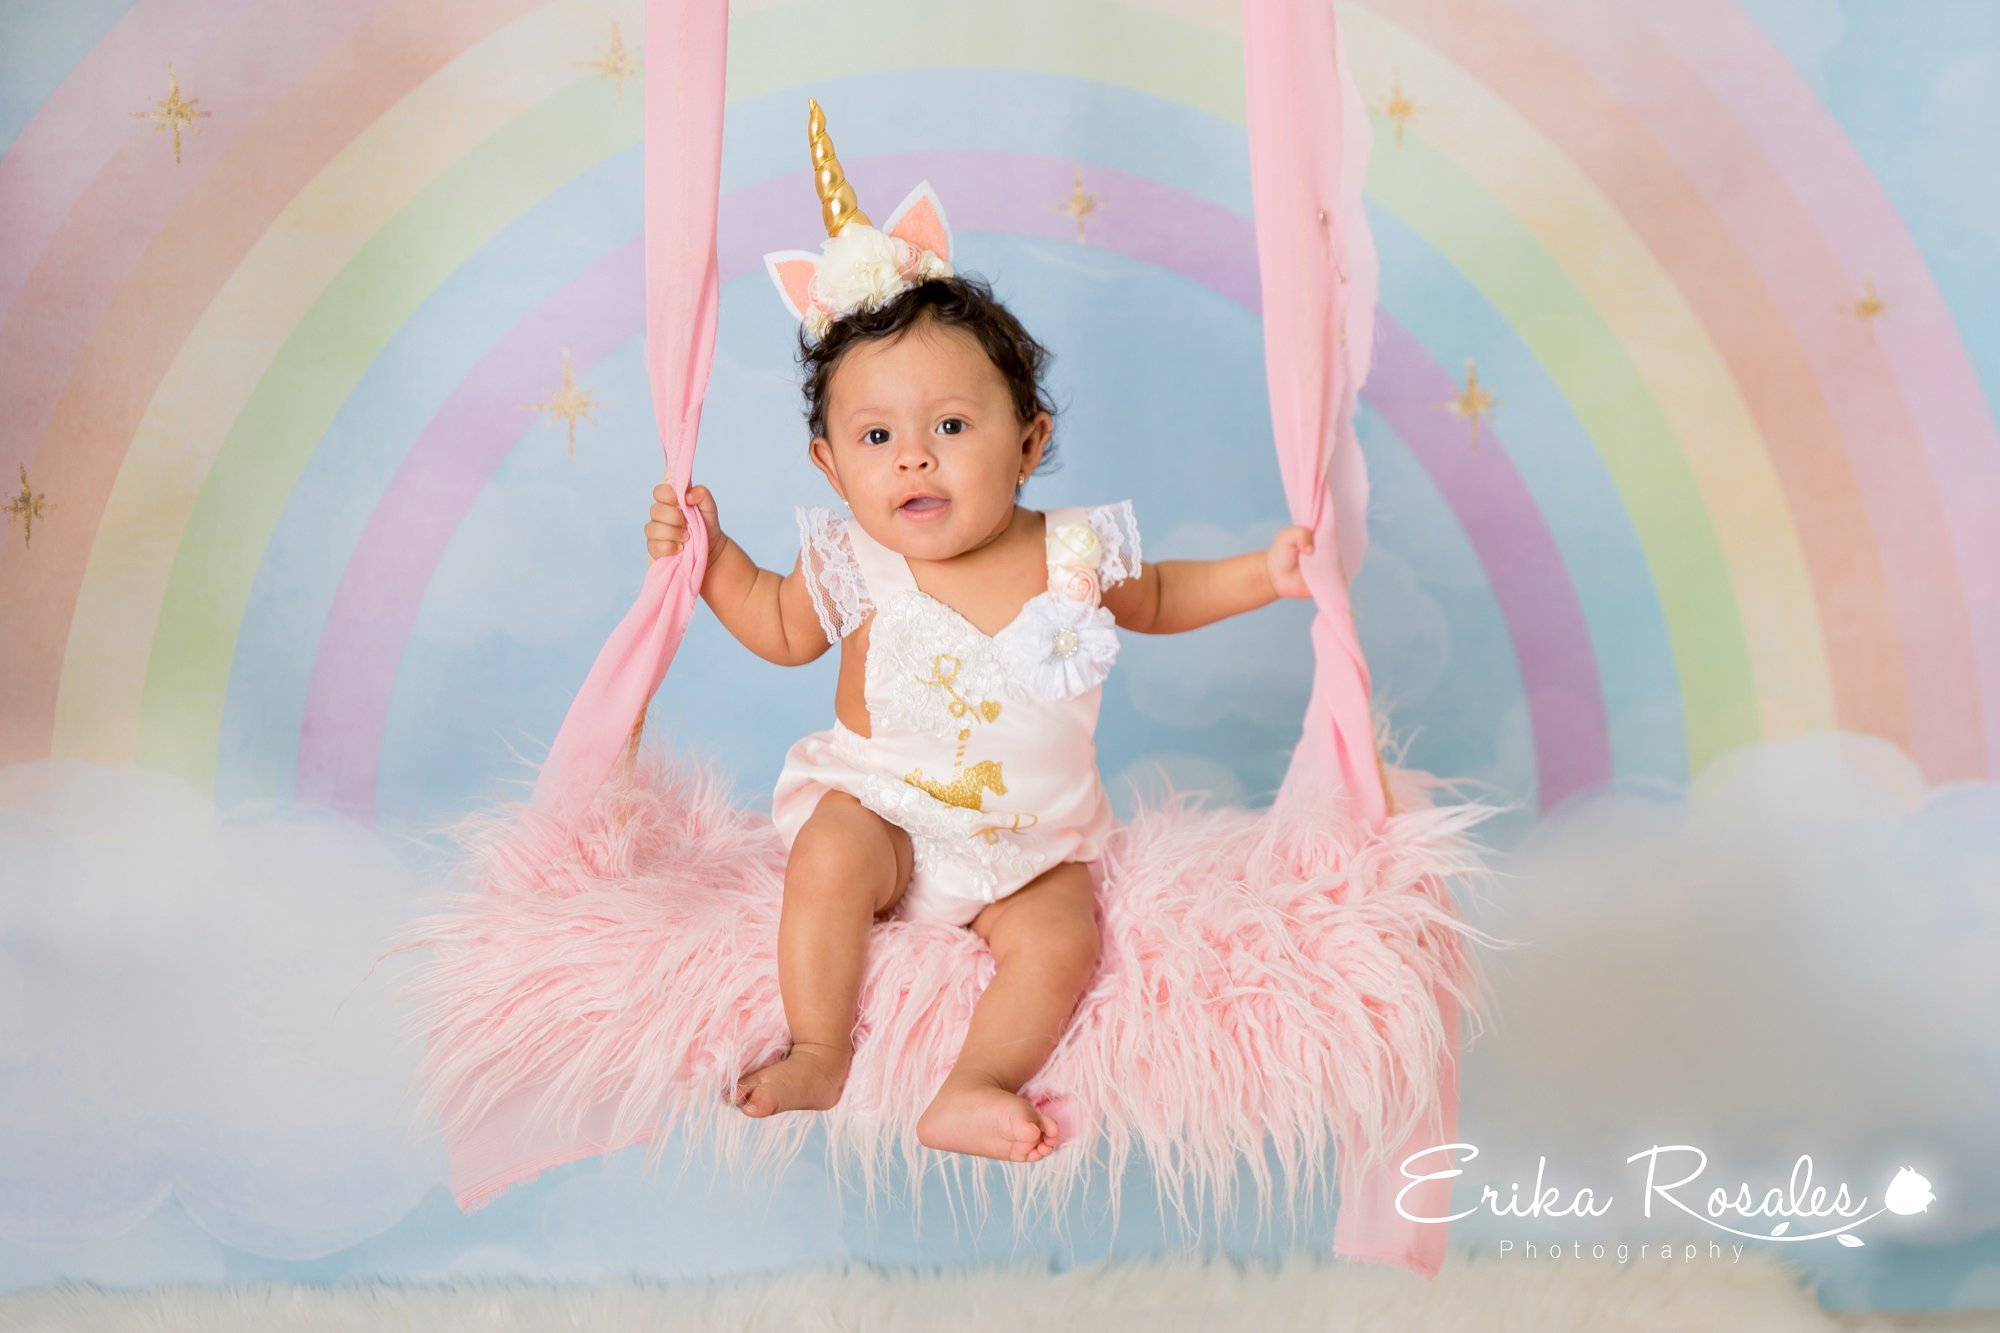 baby girl 7 month old studio photo session unicorn photo session